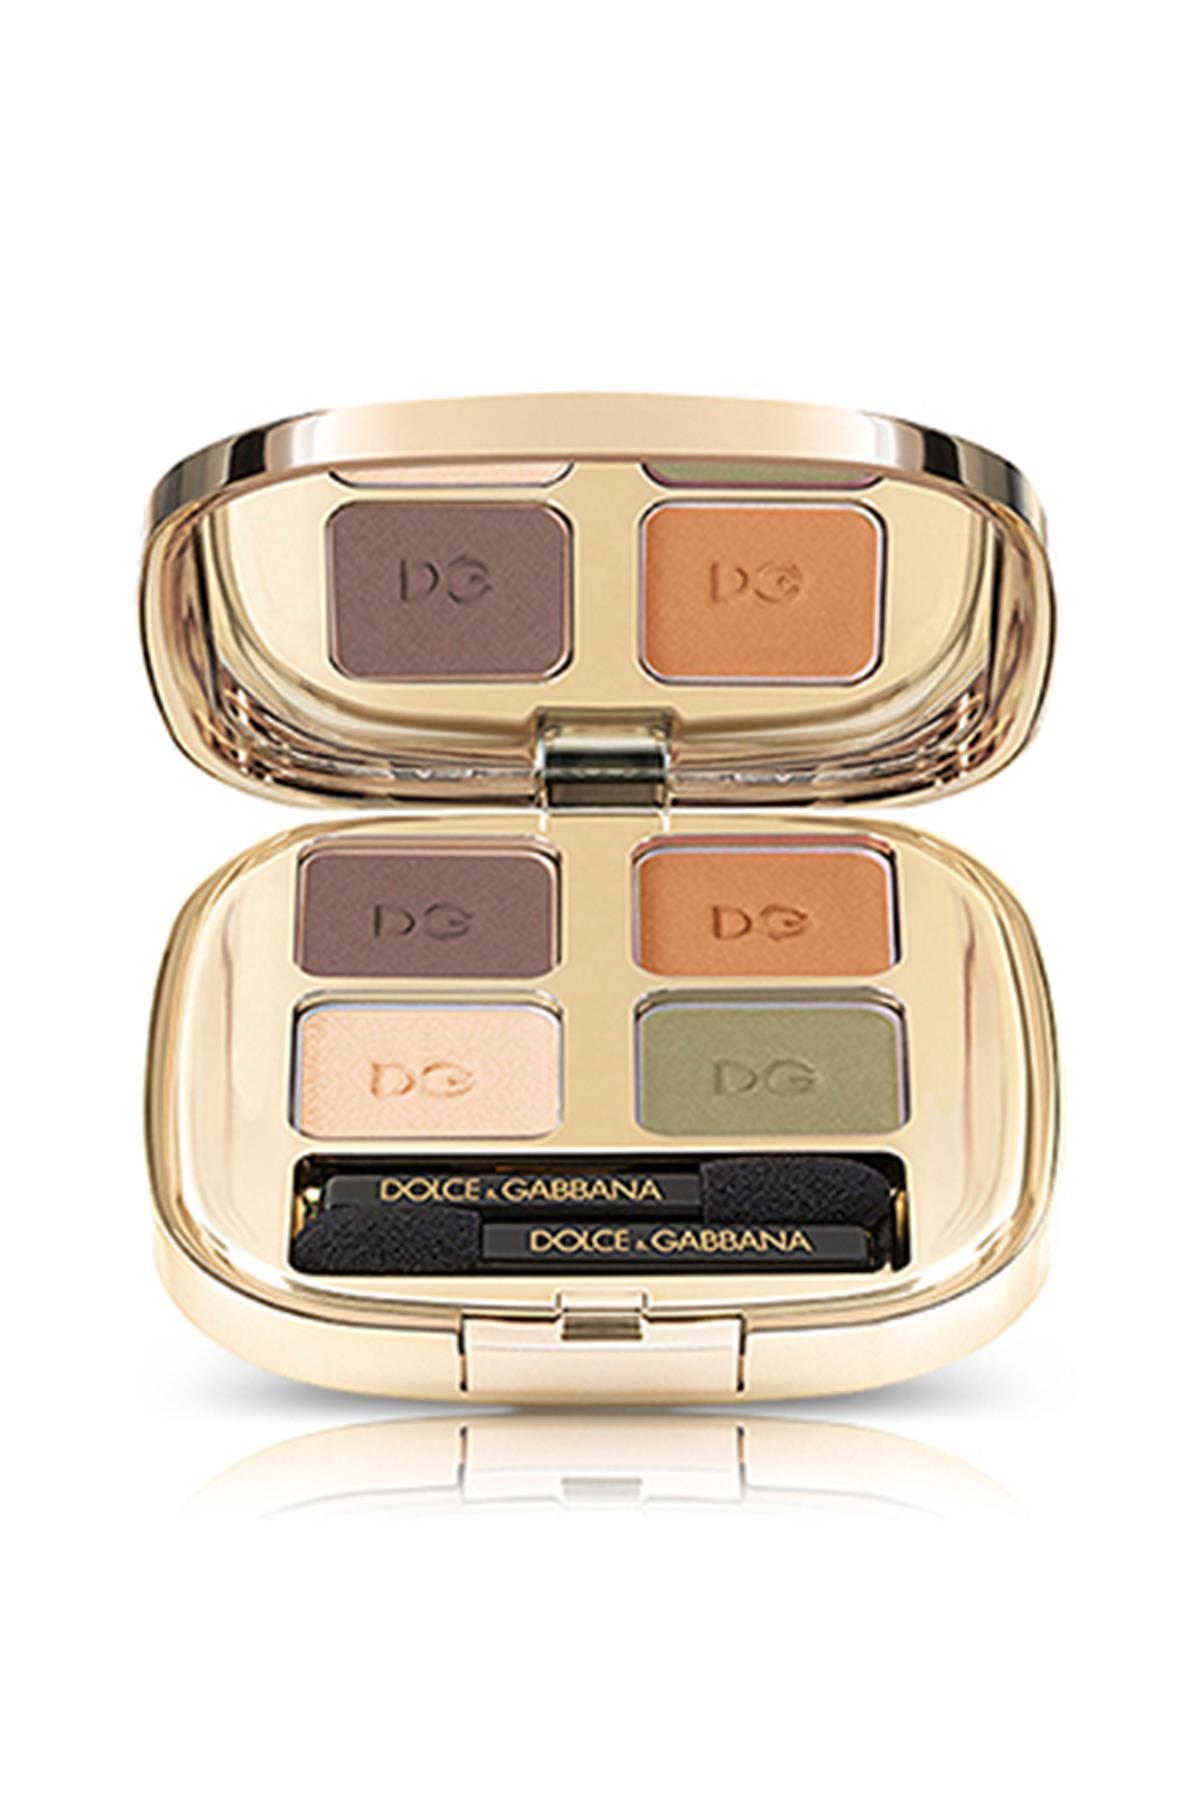 Dolce Gabbana Smooth Eye Colour Quad Göz Farı 120 Mediterraneo